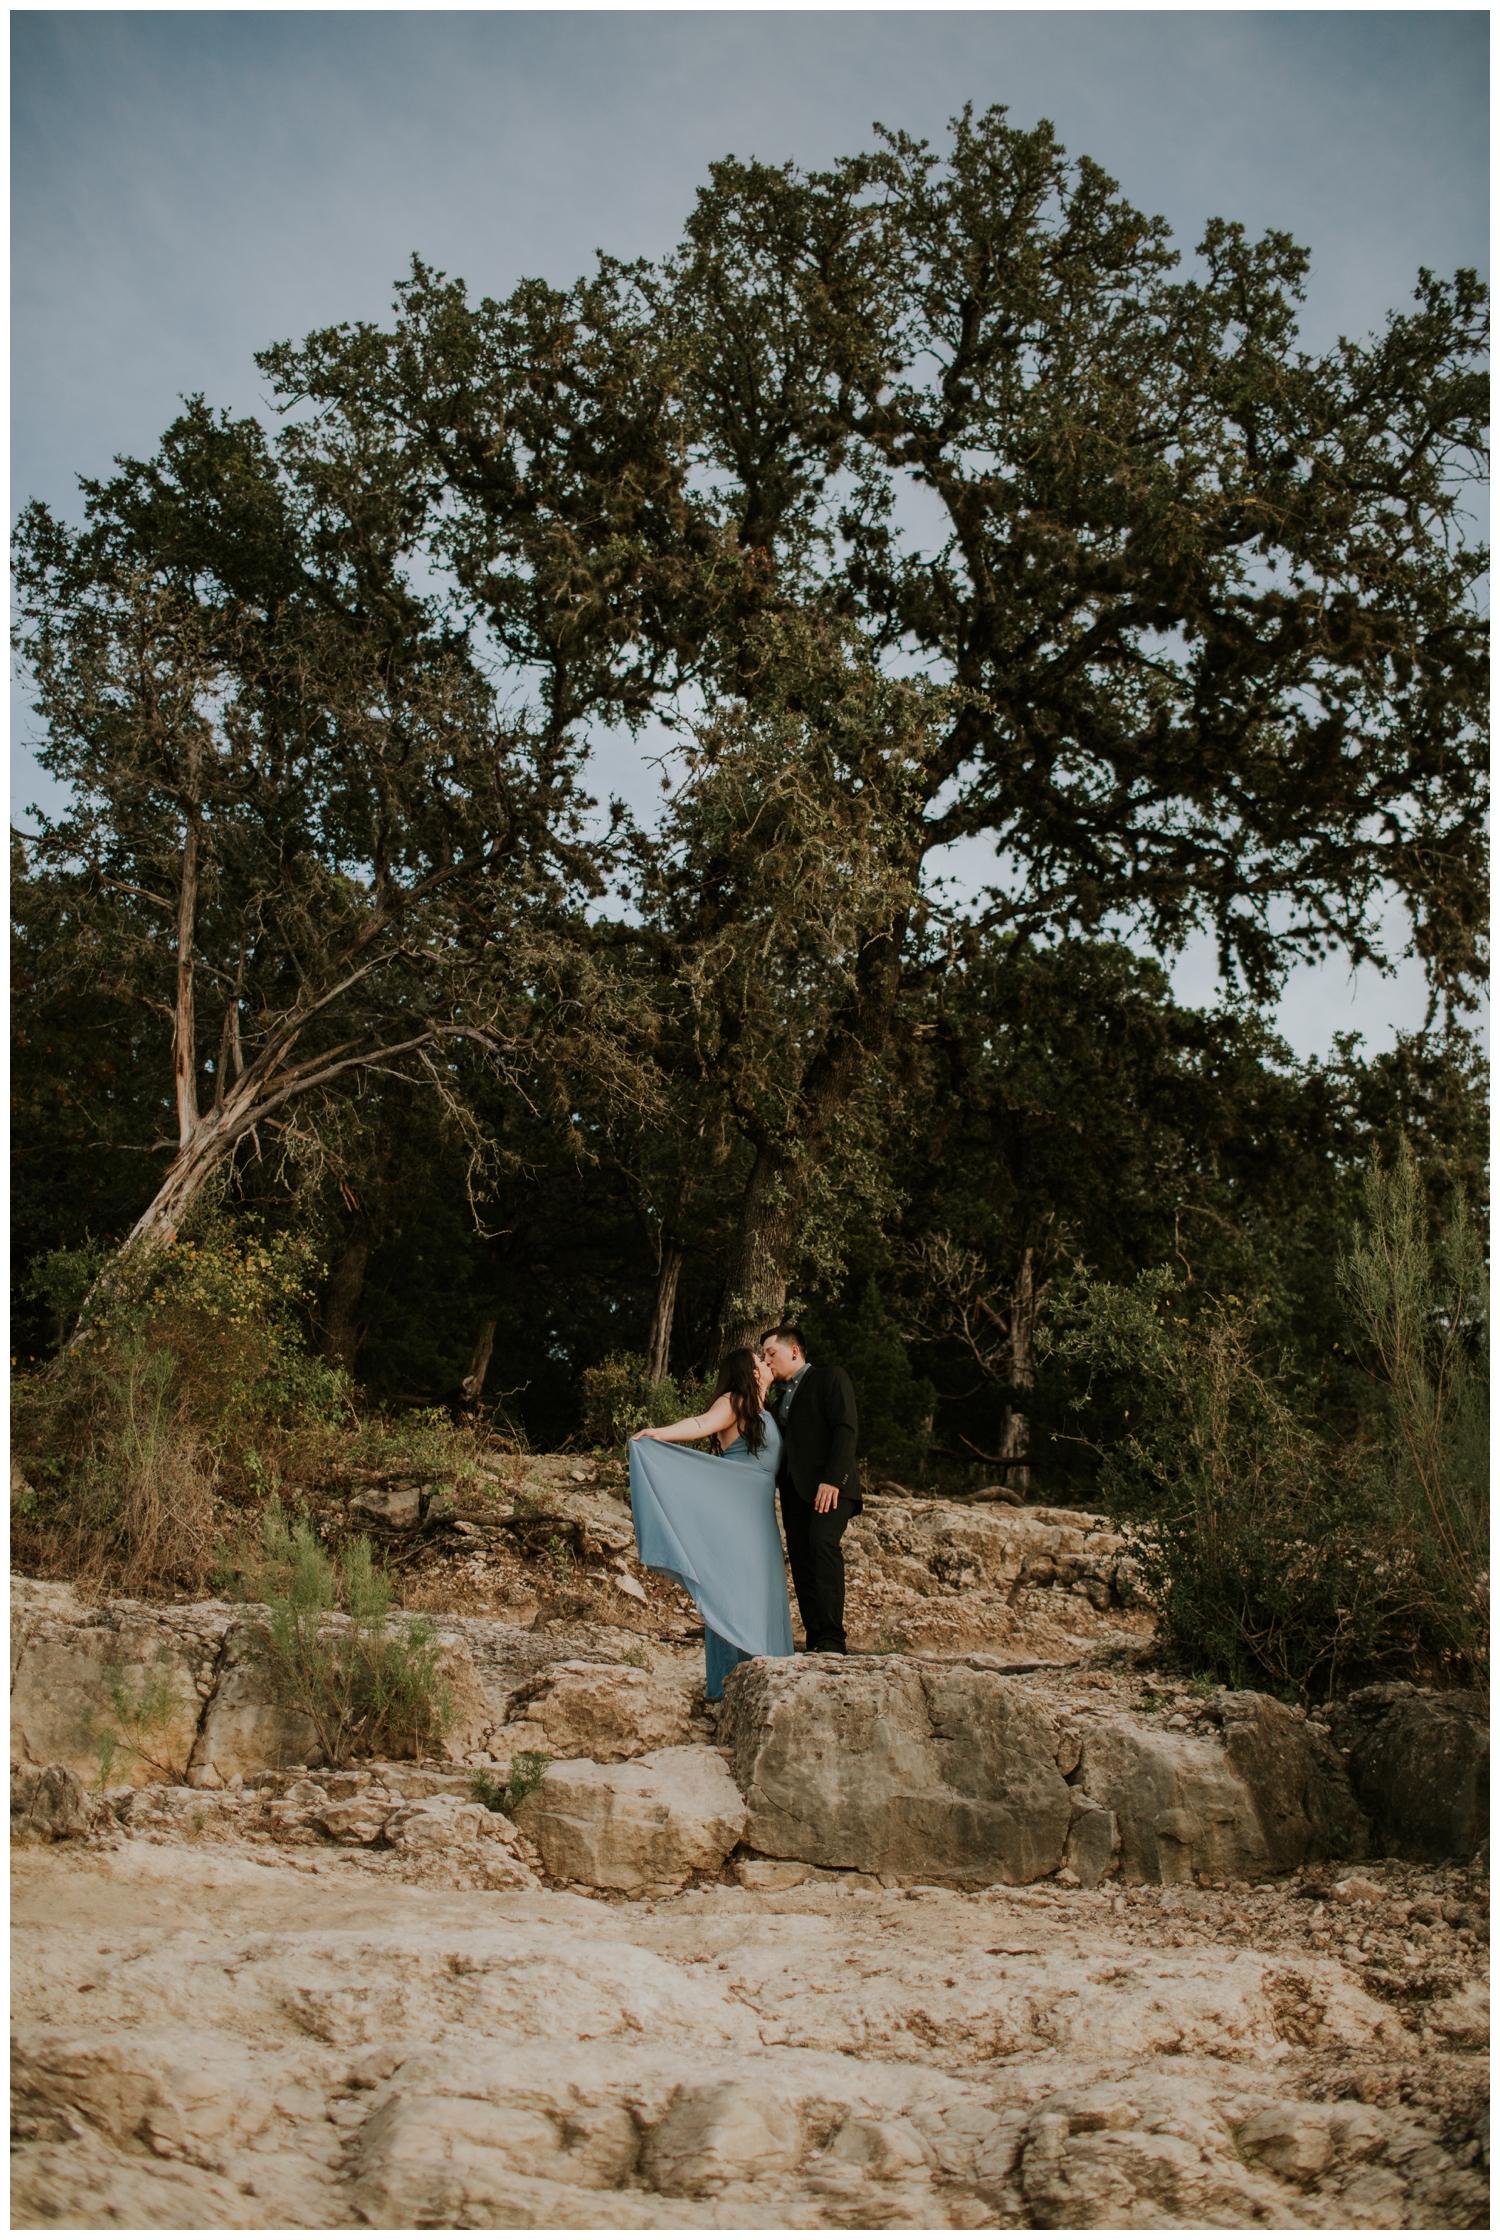 S+M, Engagement Photography Videography Canyon Lake, Texas_0036.jpg